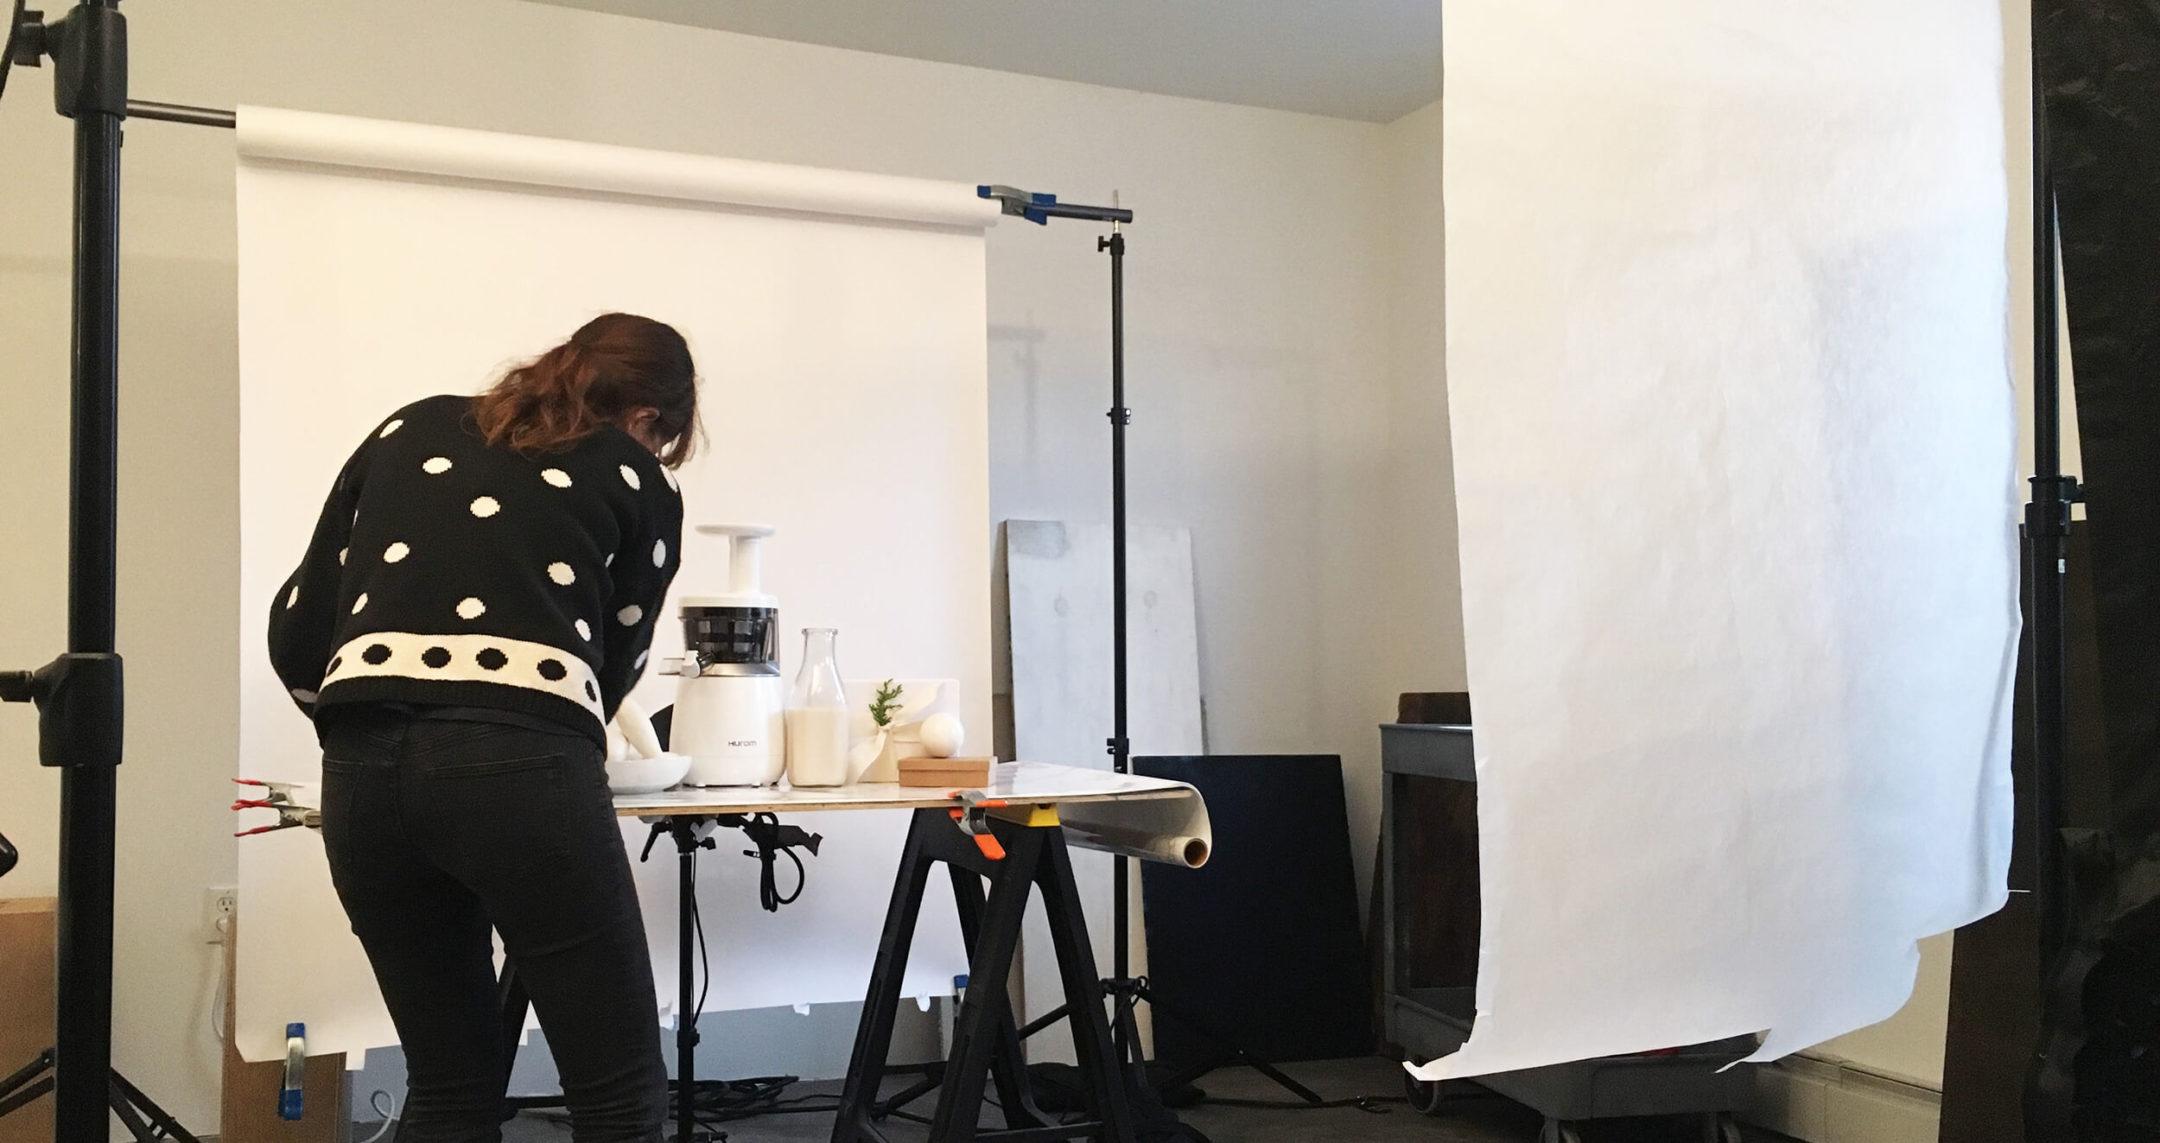 woman setting up photoshoot on white backdrop